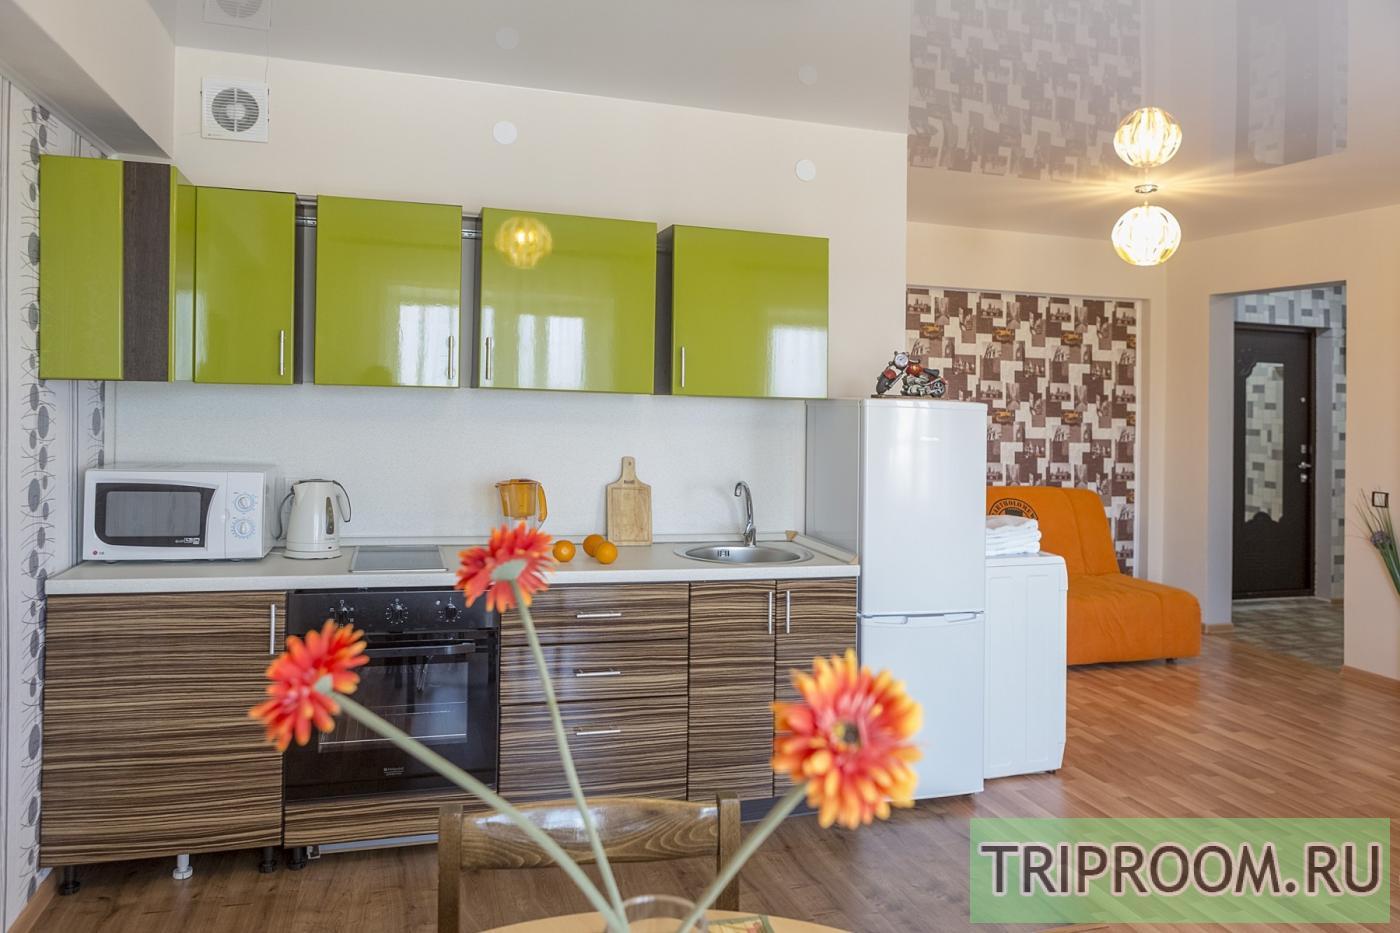 1-комнатная квартира посуточно (вариант № 35709), ул. Ядринцева улица, фото № 3